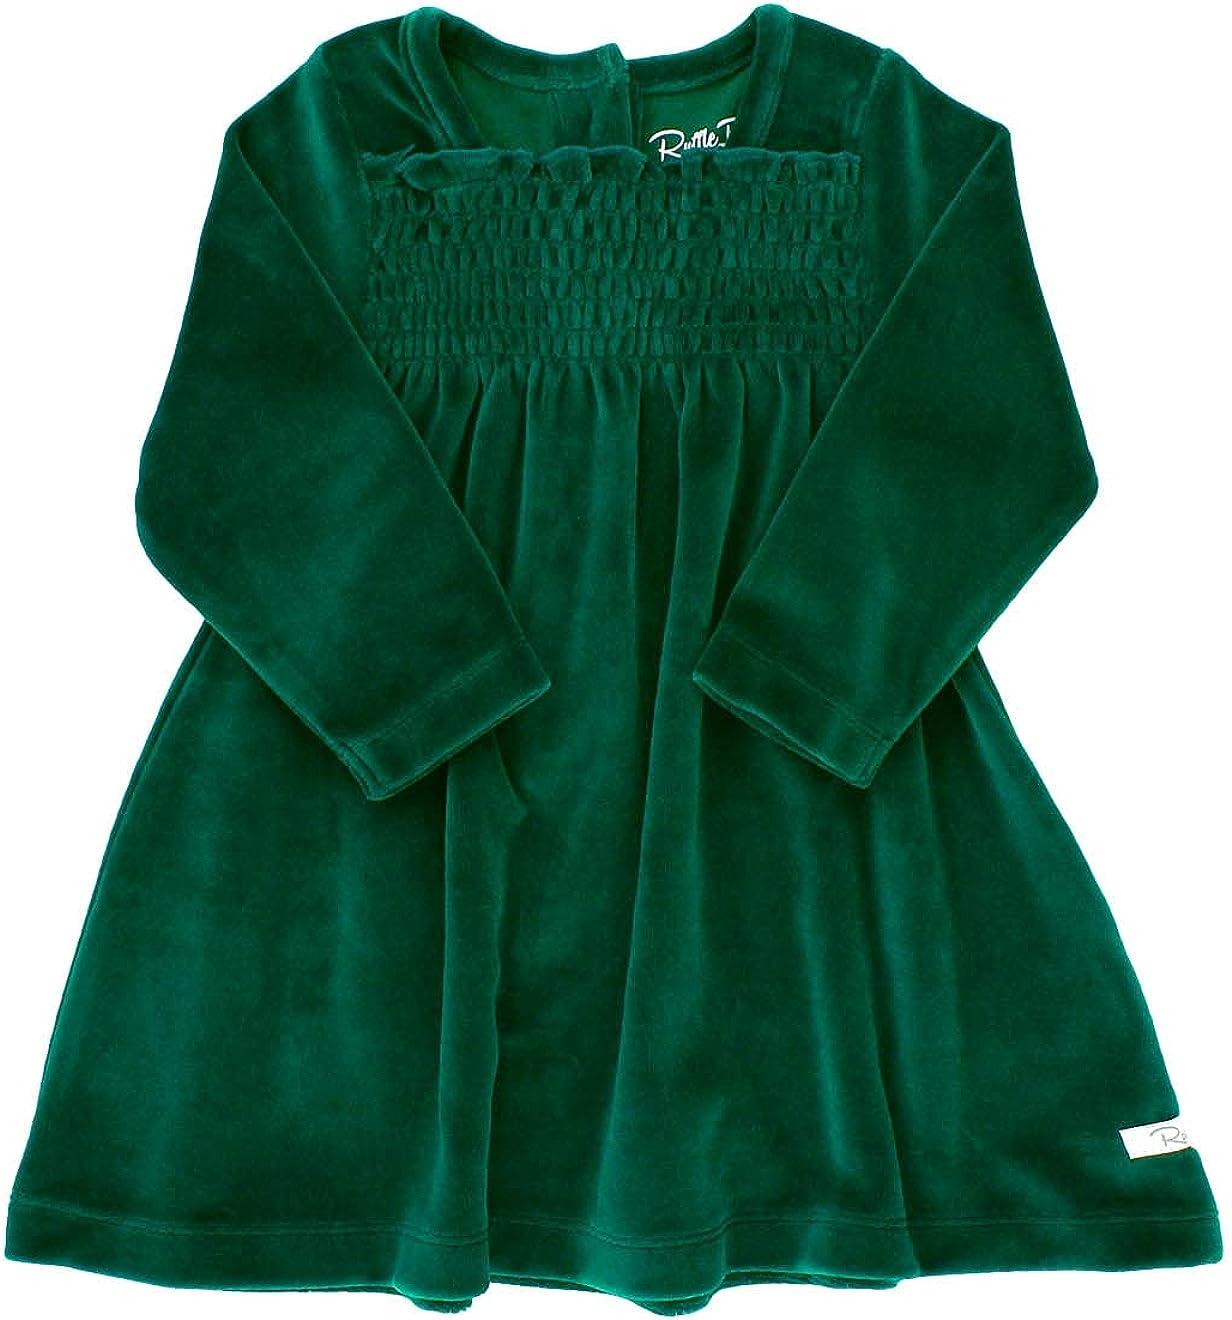 RuffleButts Many popular brands Baby Toddler Girls Flowy Virginia Beach Mall Button Back Tiered Dress